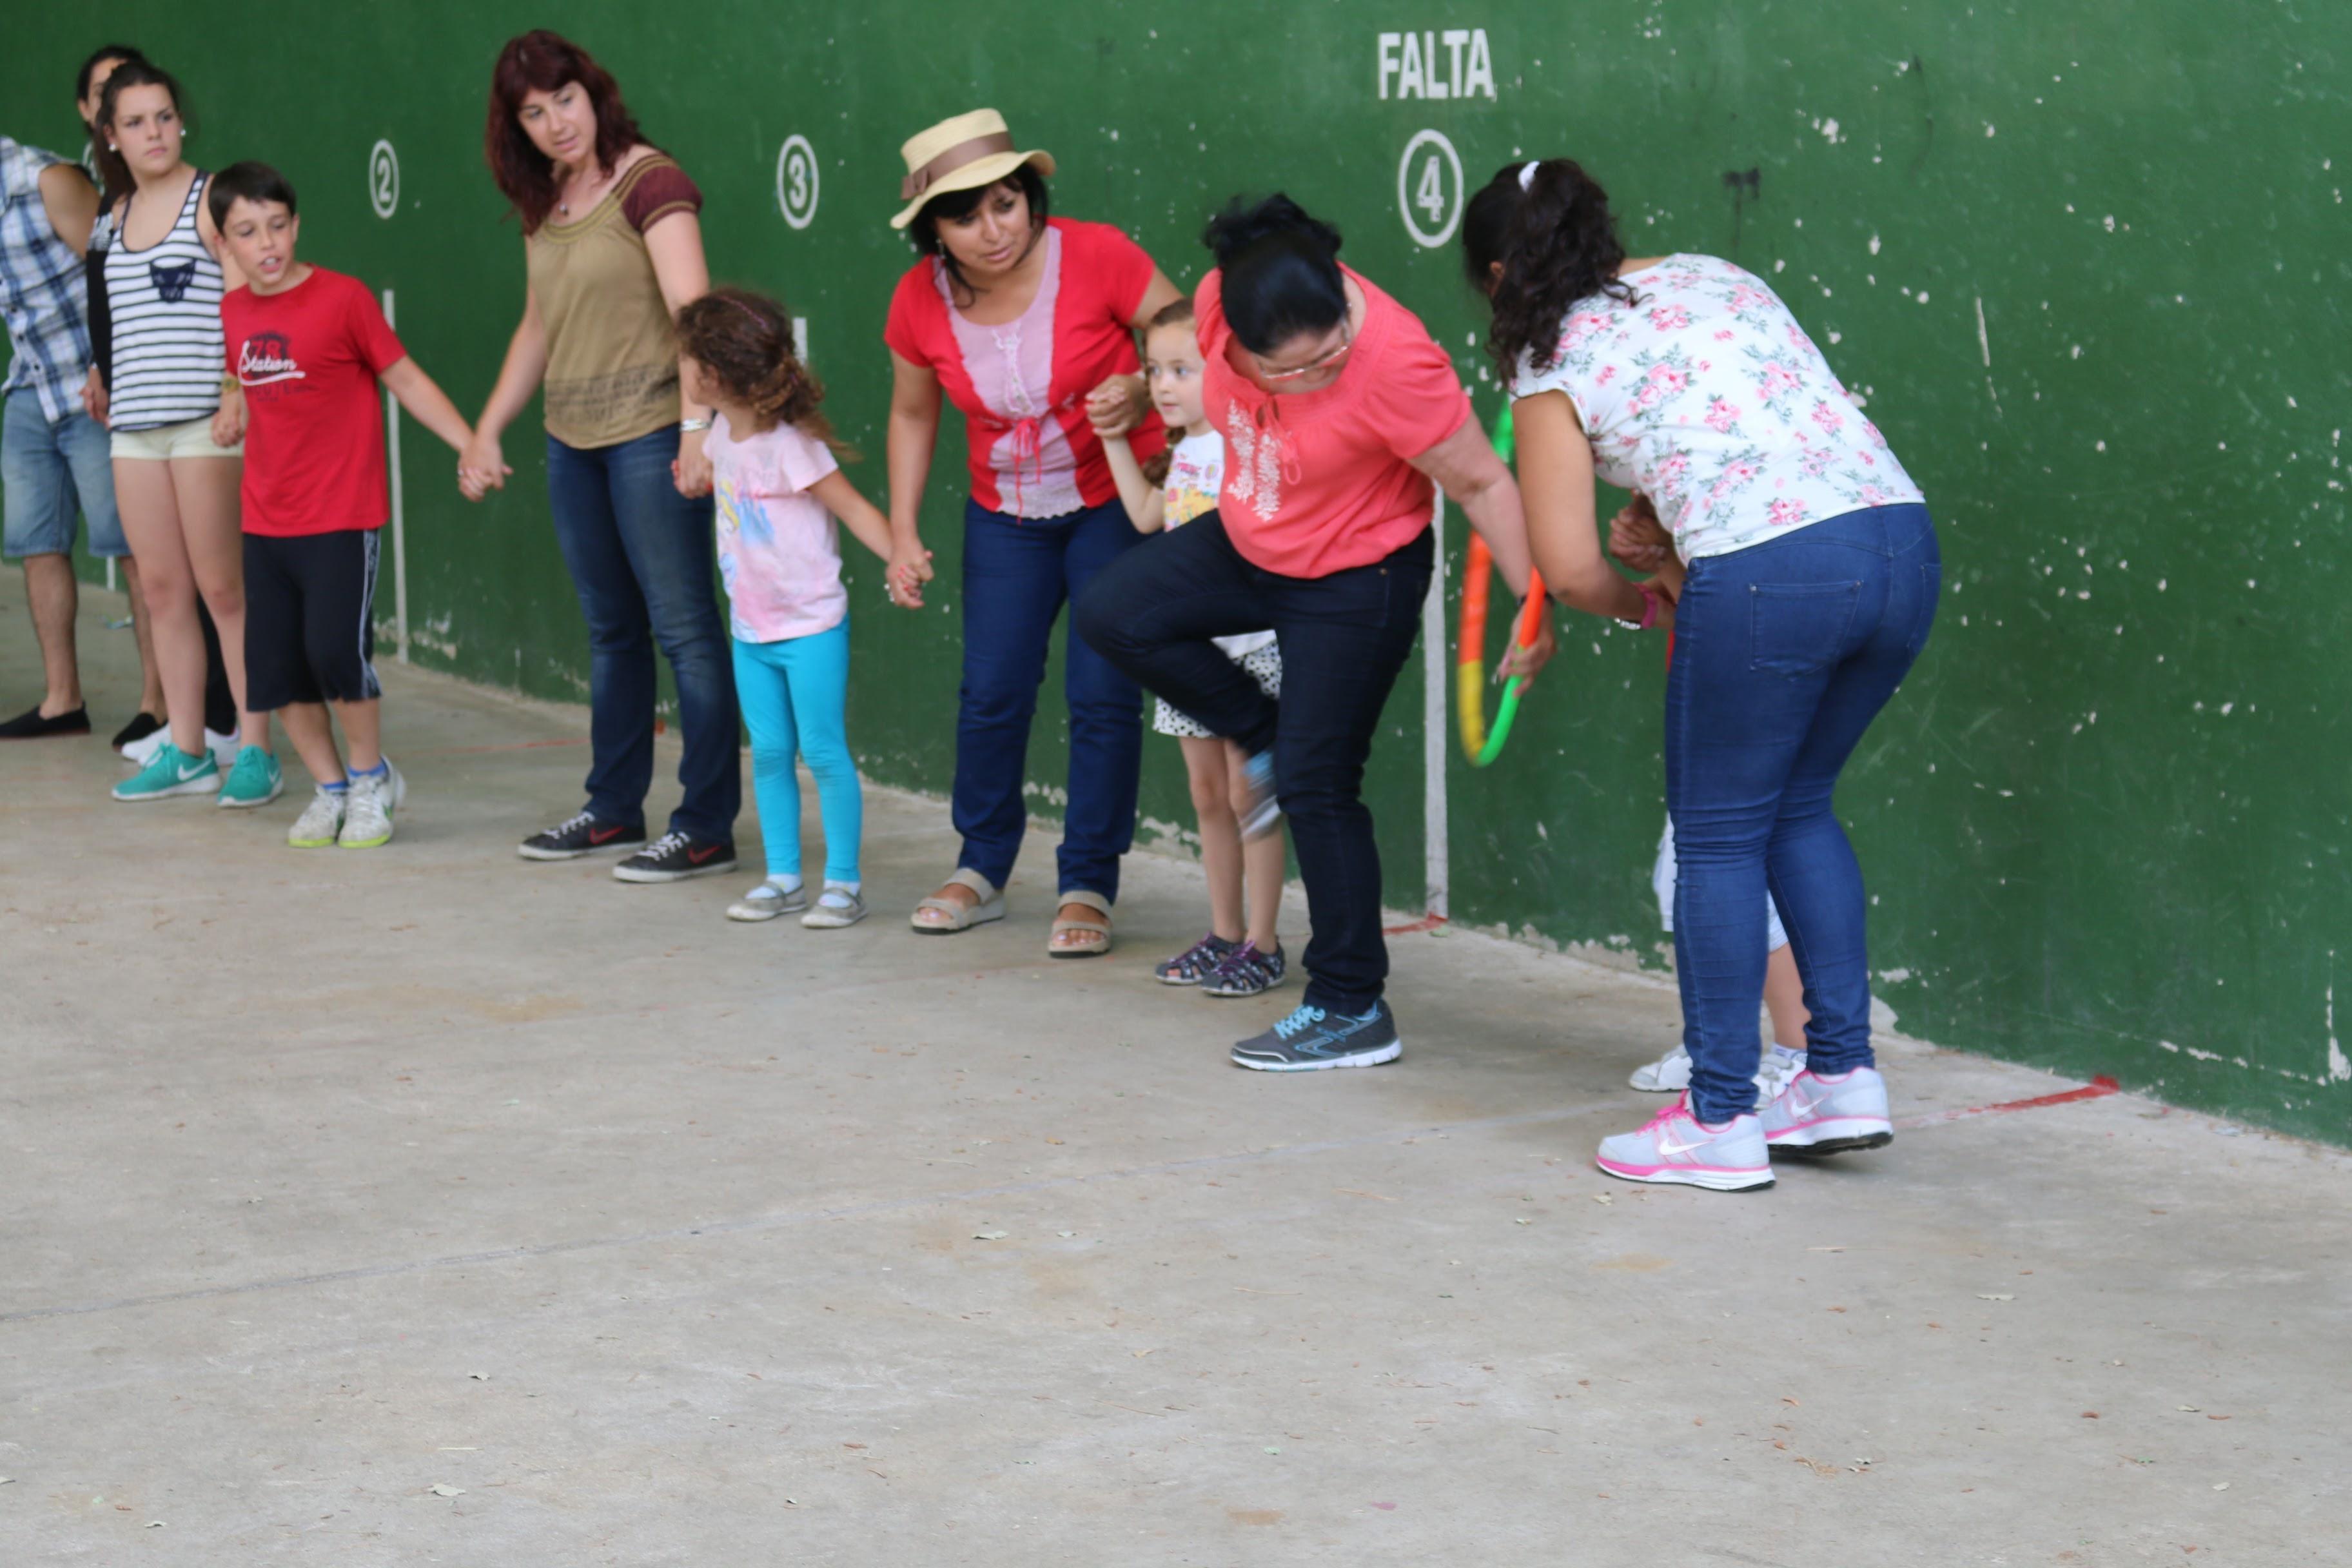 Picasa - Día de Campo SdJ 05.07.2015 (36).jpg